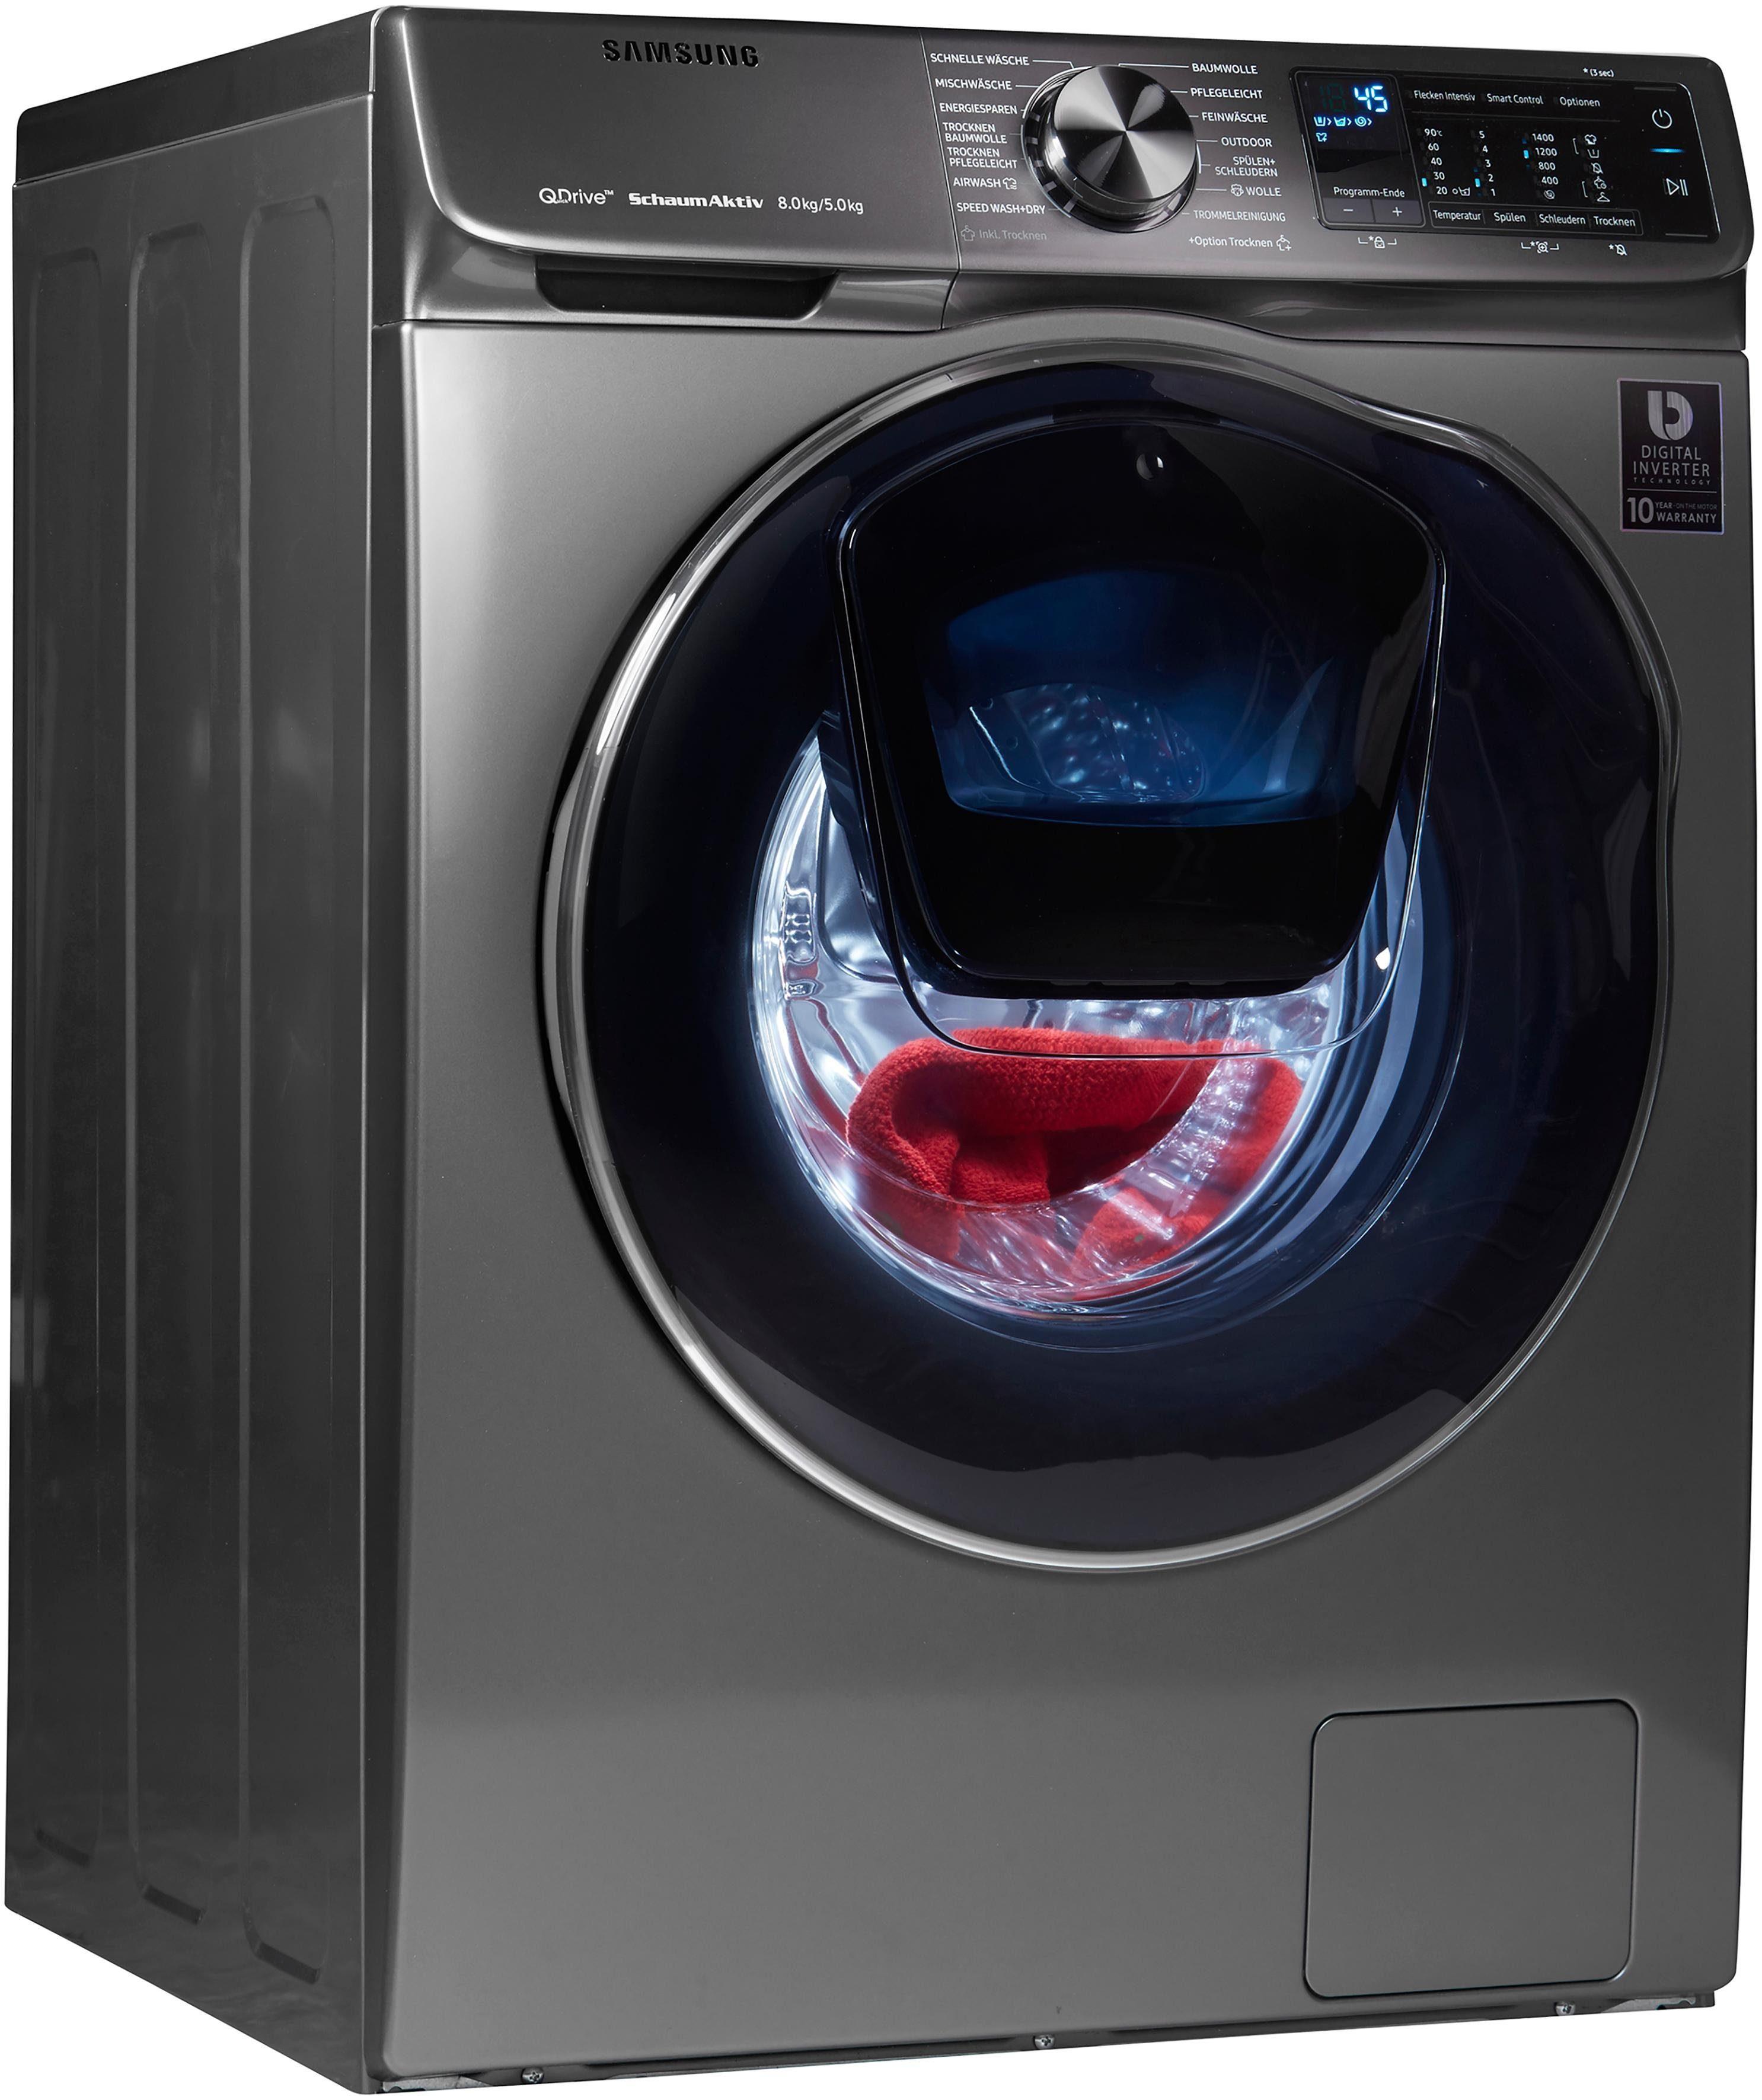 Samsung Waschtrockner WD6800 QuickDrive WD80N642OOX, 8 kg/5 kg, 1400 U/Min, AddWash